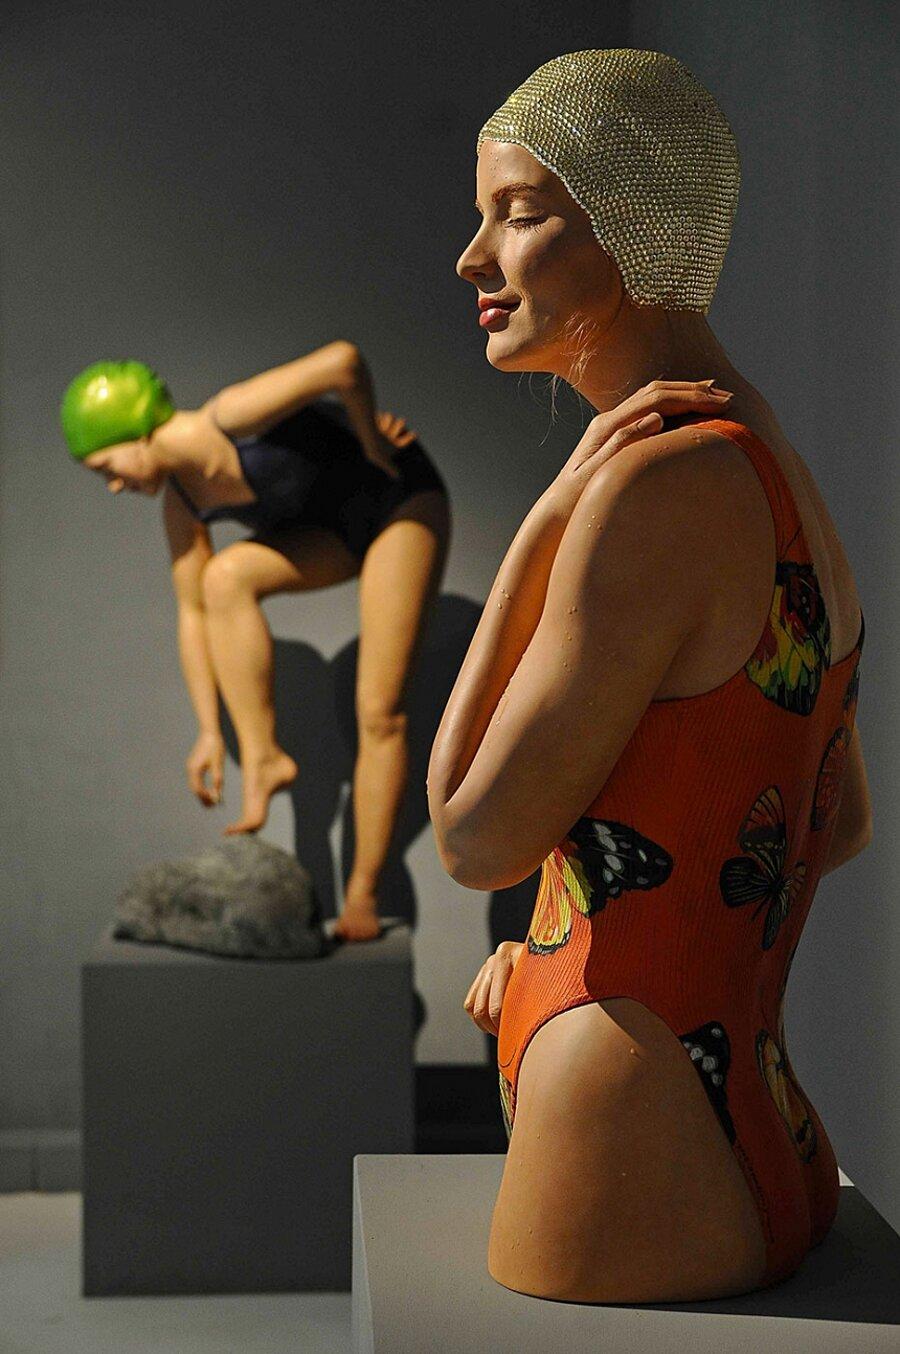 sculture-iperrealismo-donne-nuotatrici-carol-feuerman-07-keb